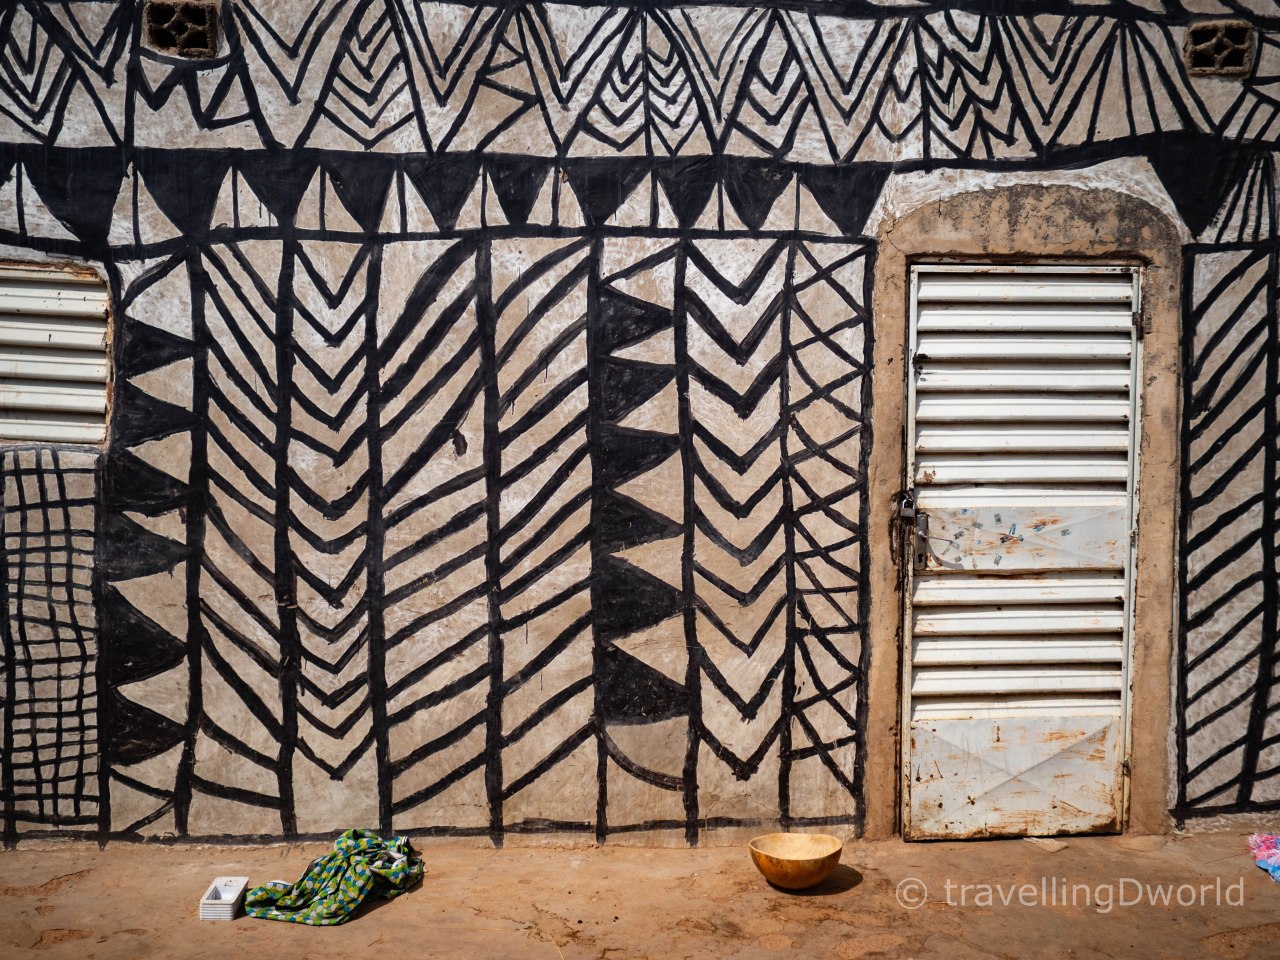 Casas de Tiebelé, Burkina Faso